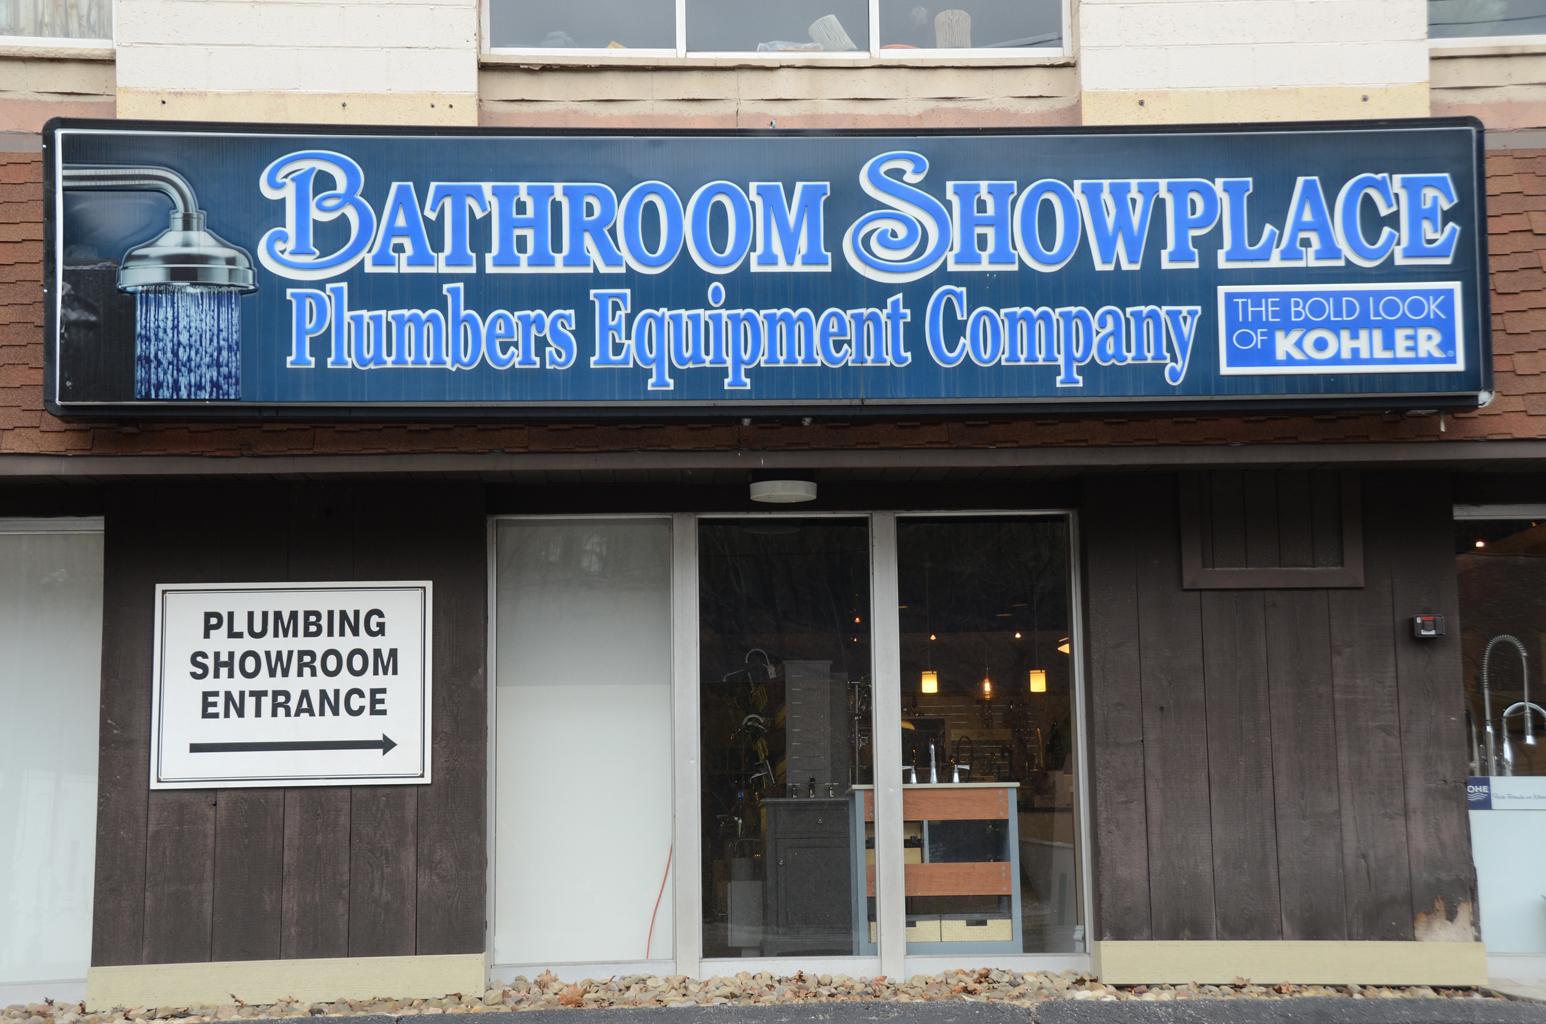 Plumbers Equipment Company - Bath and Kitchen - North Hills 2134 ...